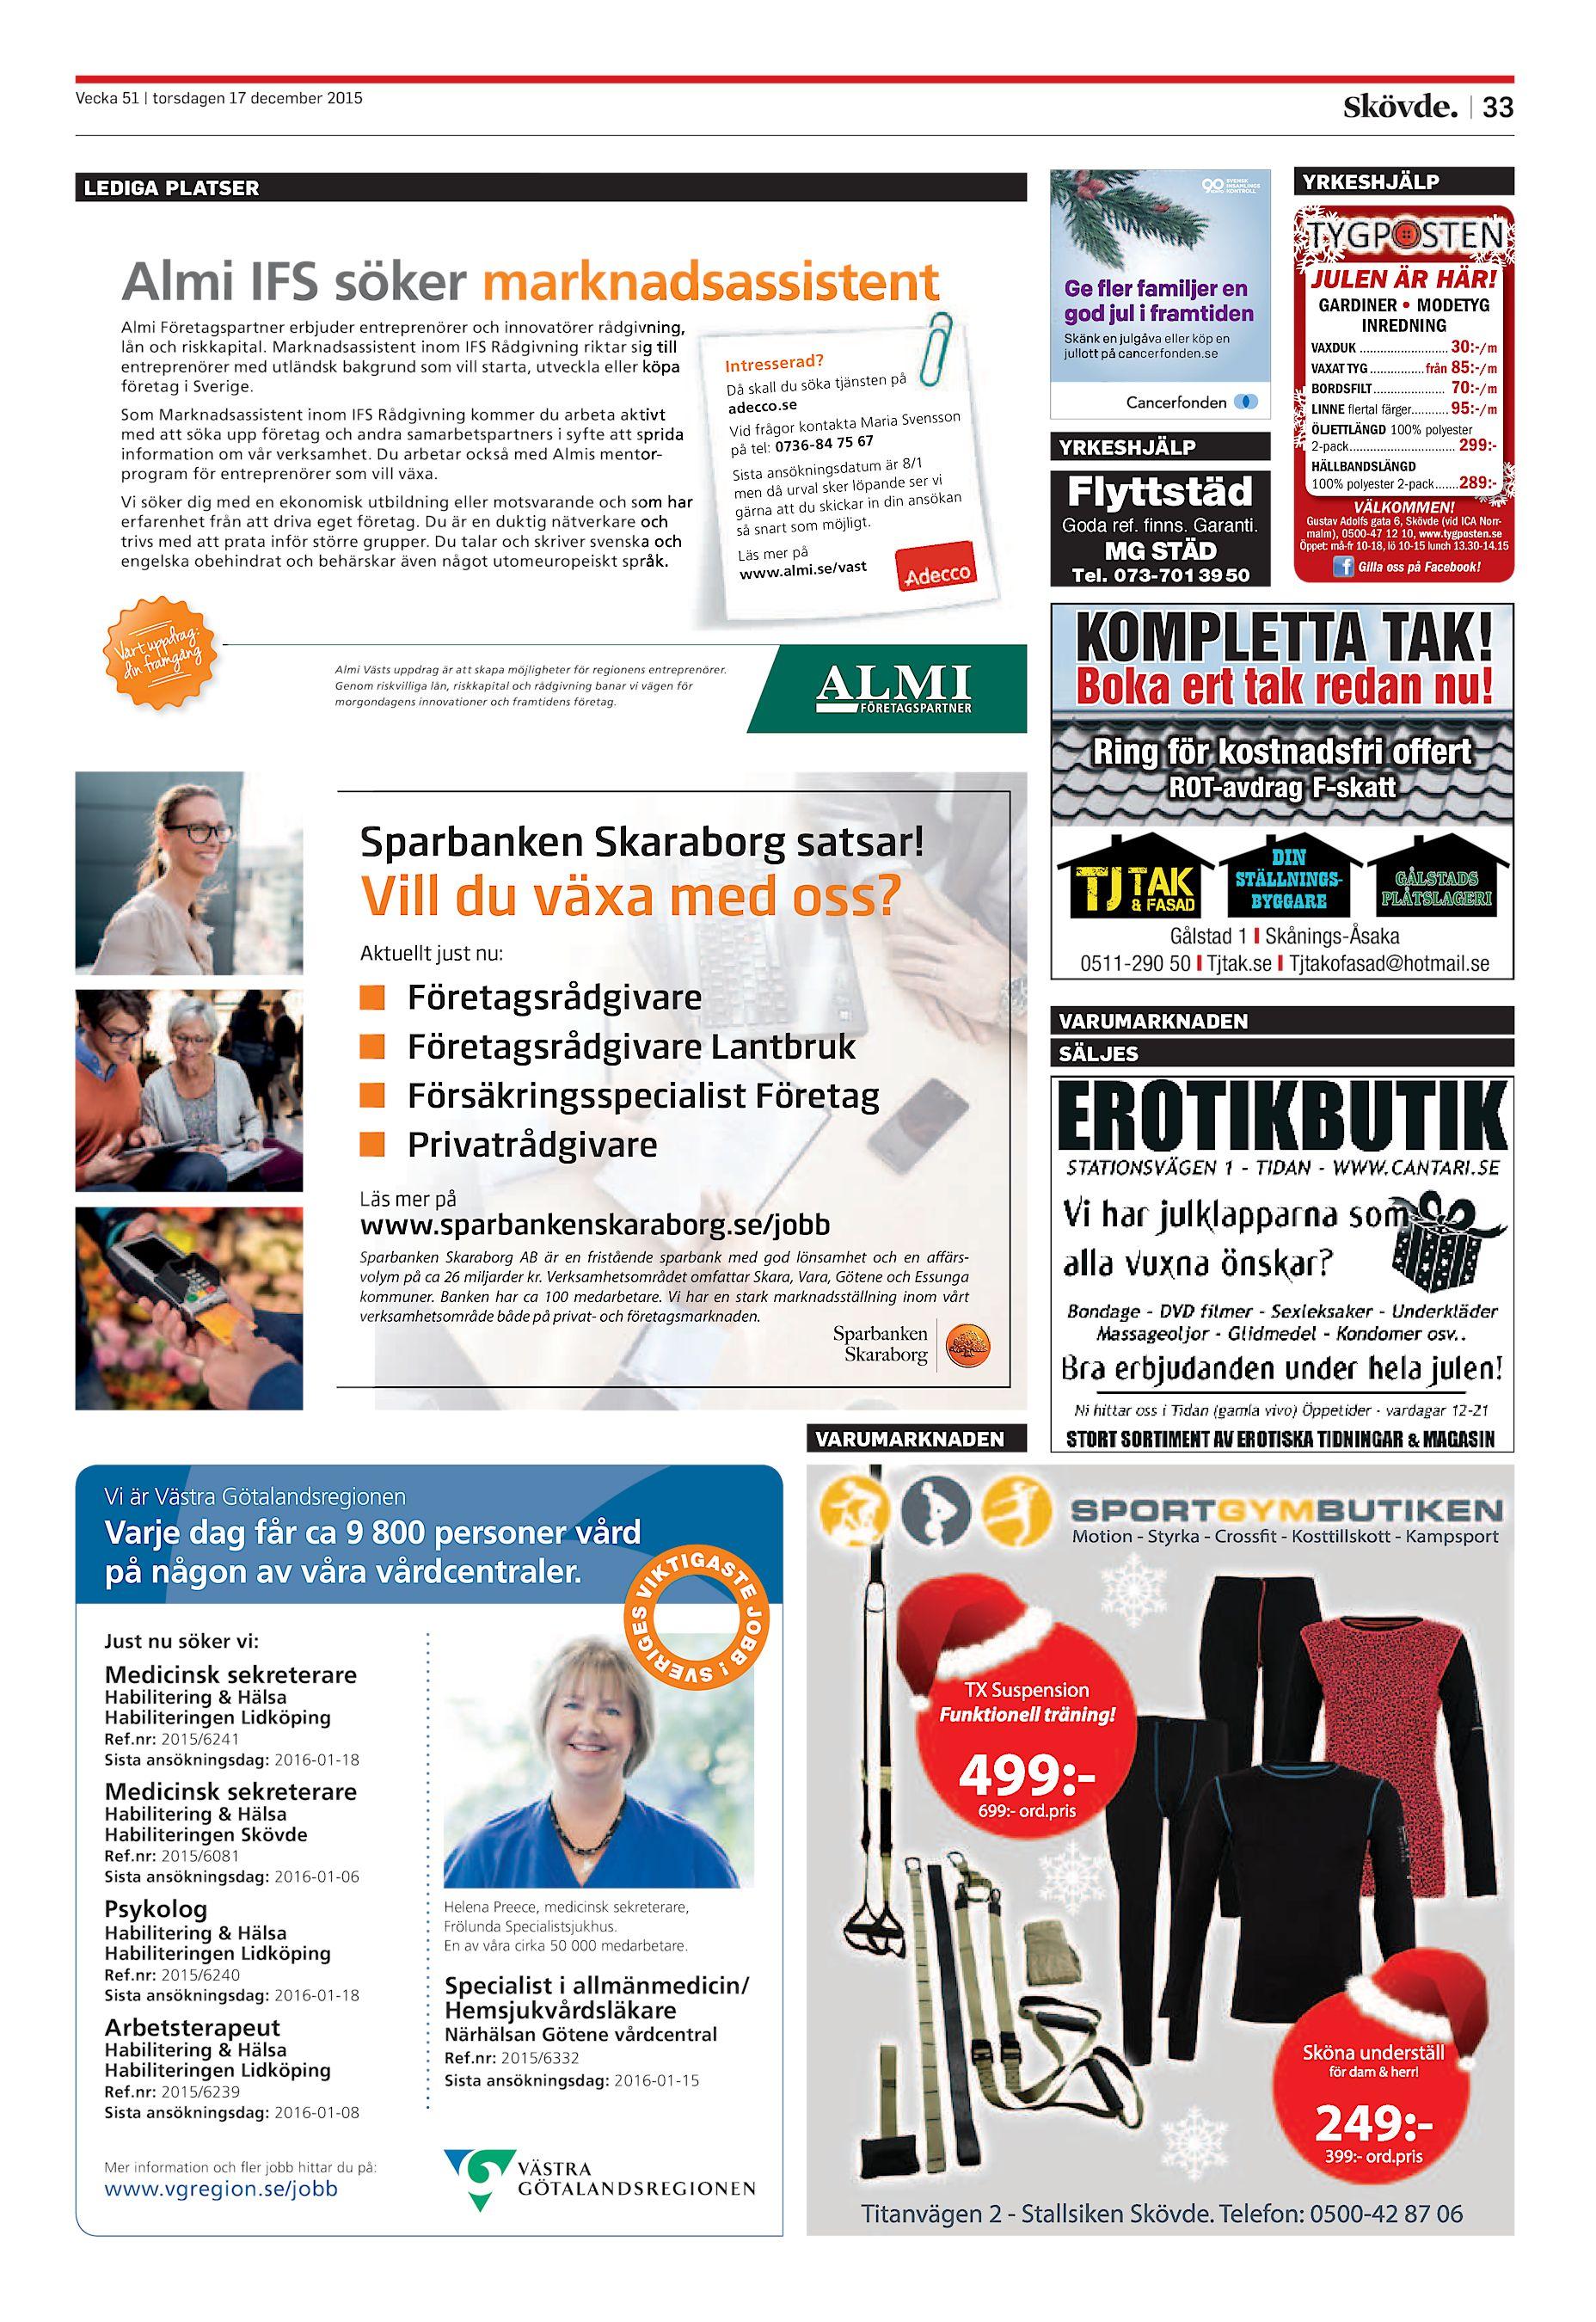 Skövde Nyheter SN-20151217 (endast text) b276a6fe97db7